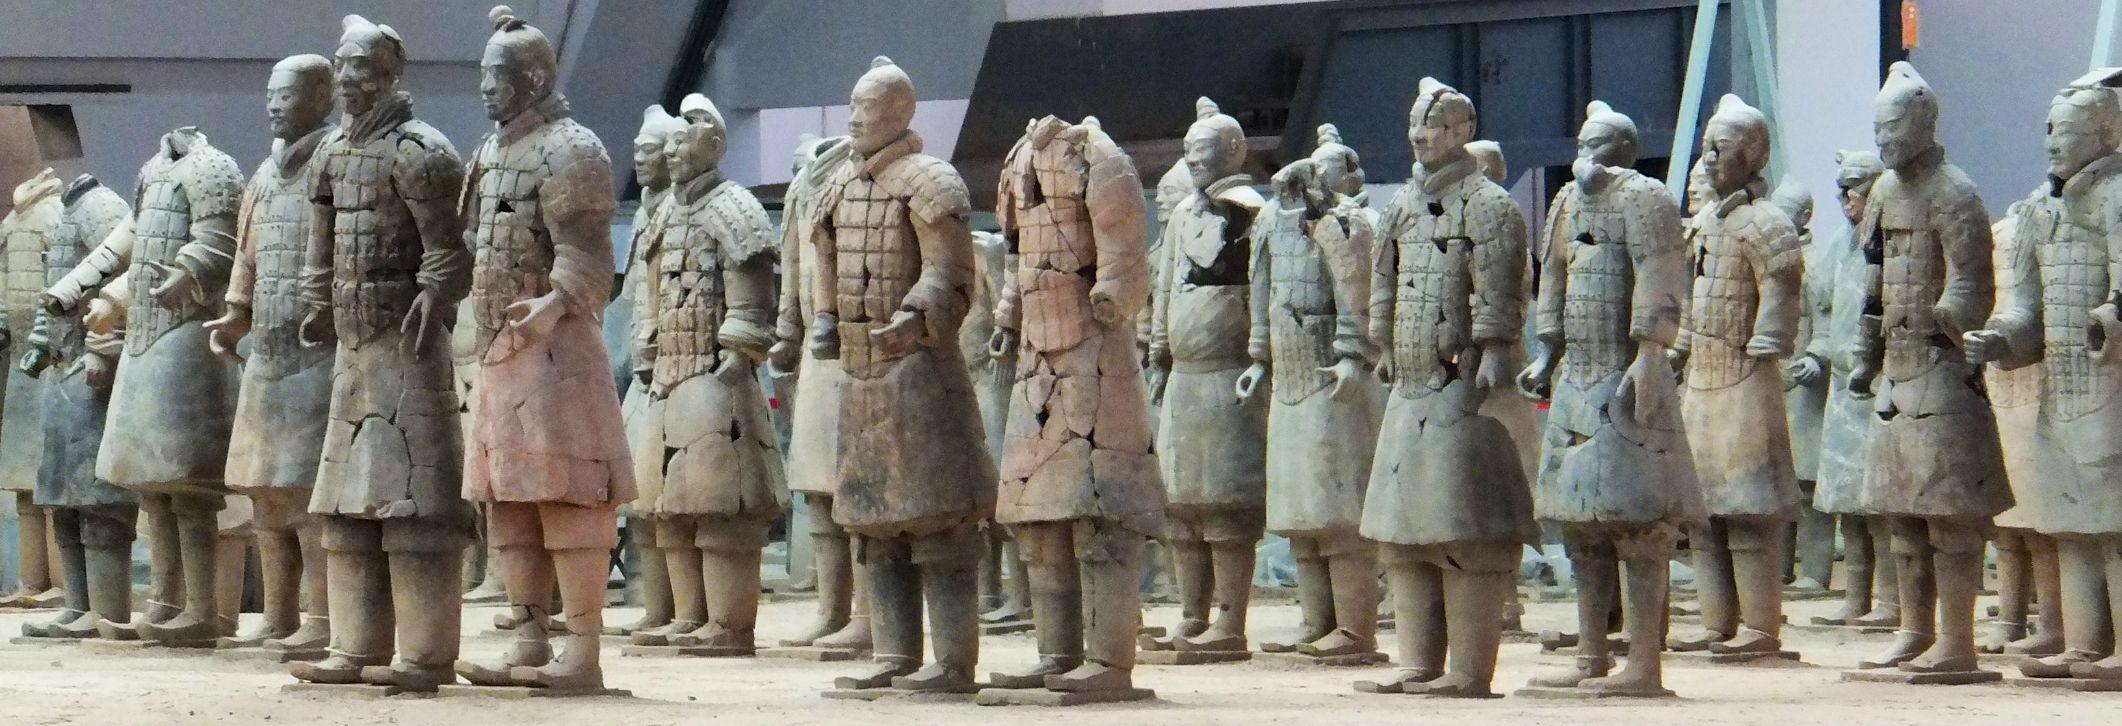 Terrakotta Arme - Xian - China